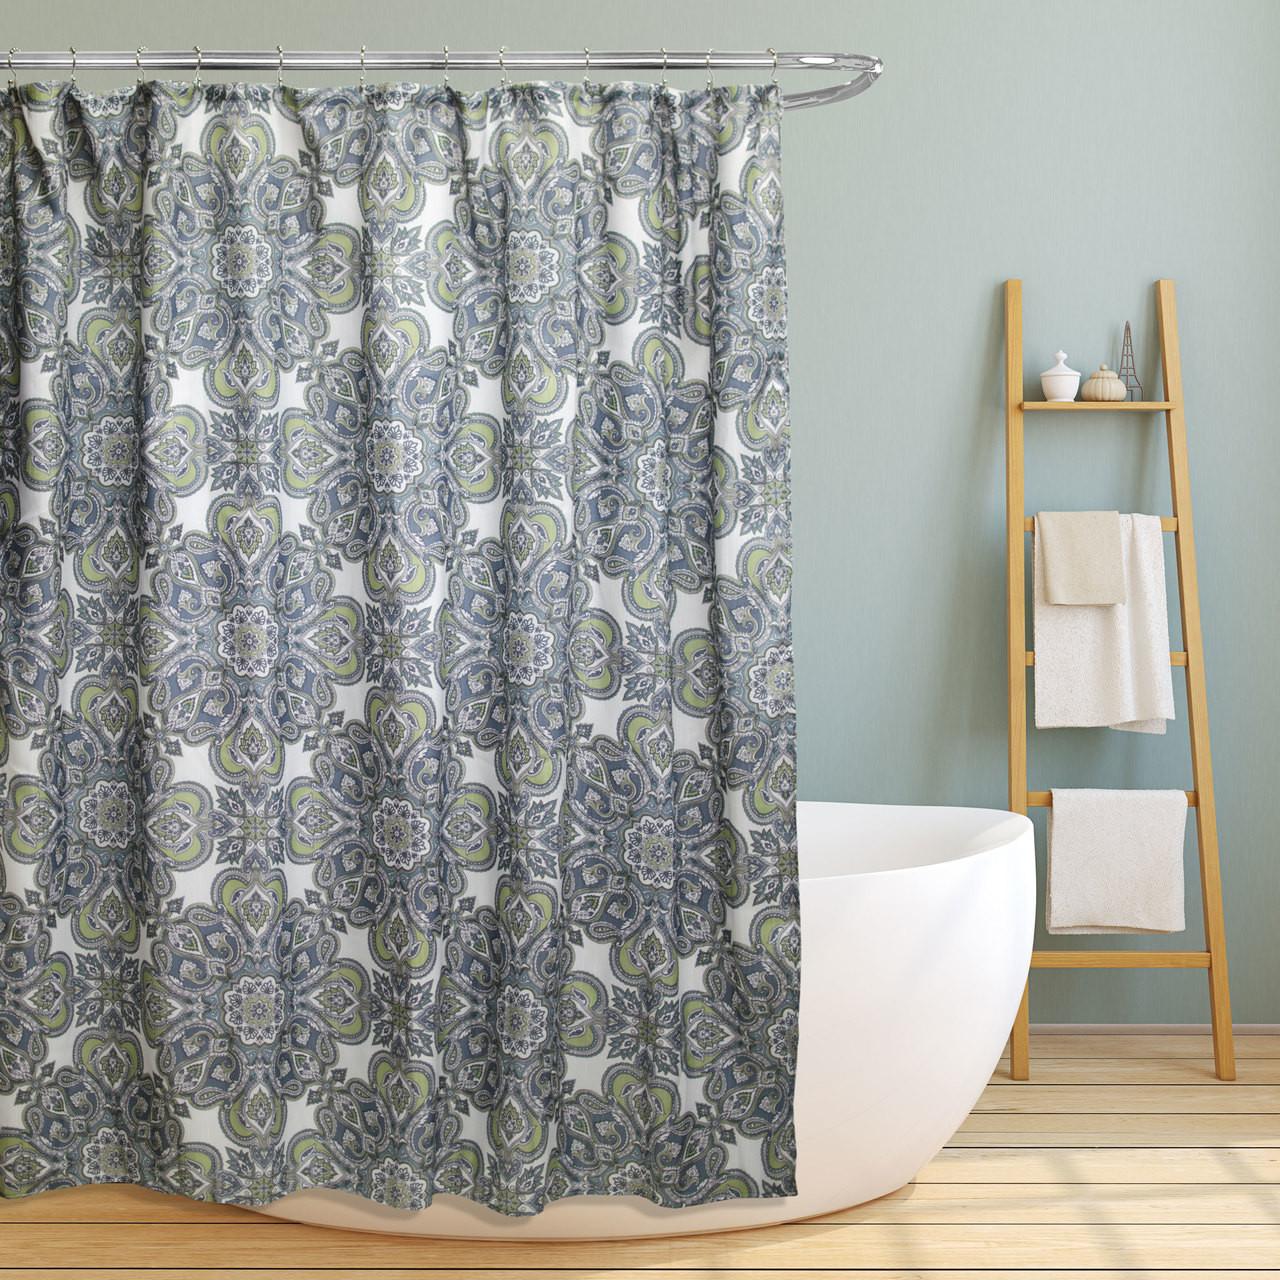 Fabric Canvas Shower Curtain 70 X70 Amy Geometric Paisley Floral Design